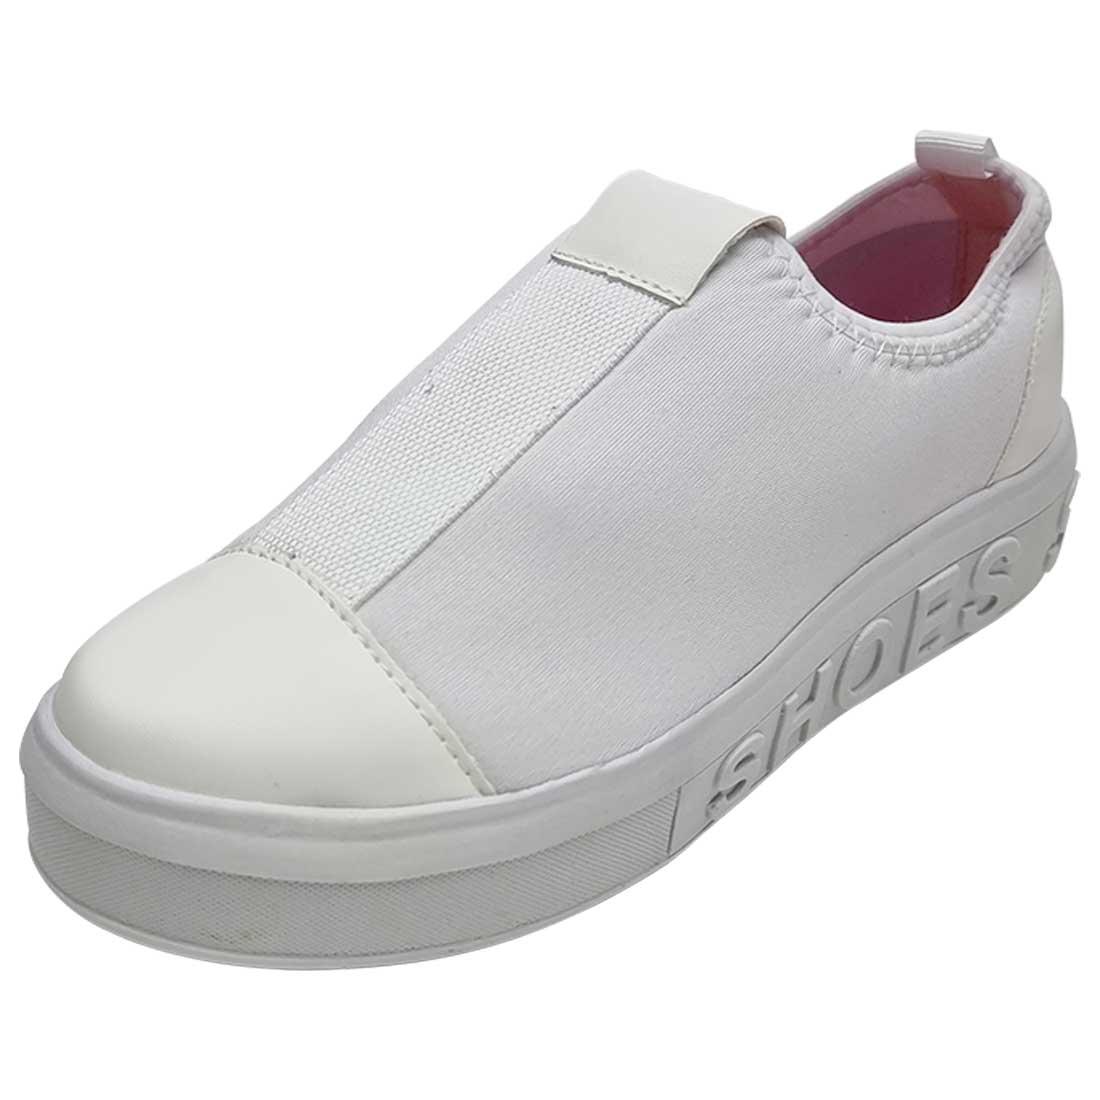 Tênis Meia Comfort Neoprene Shoes - Branco